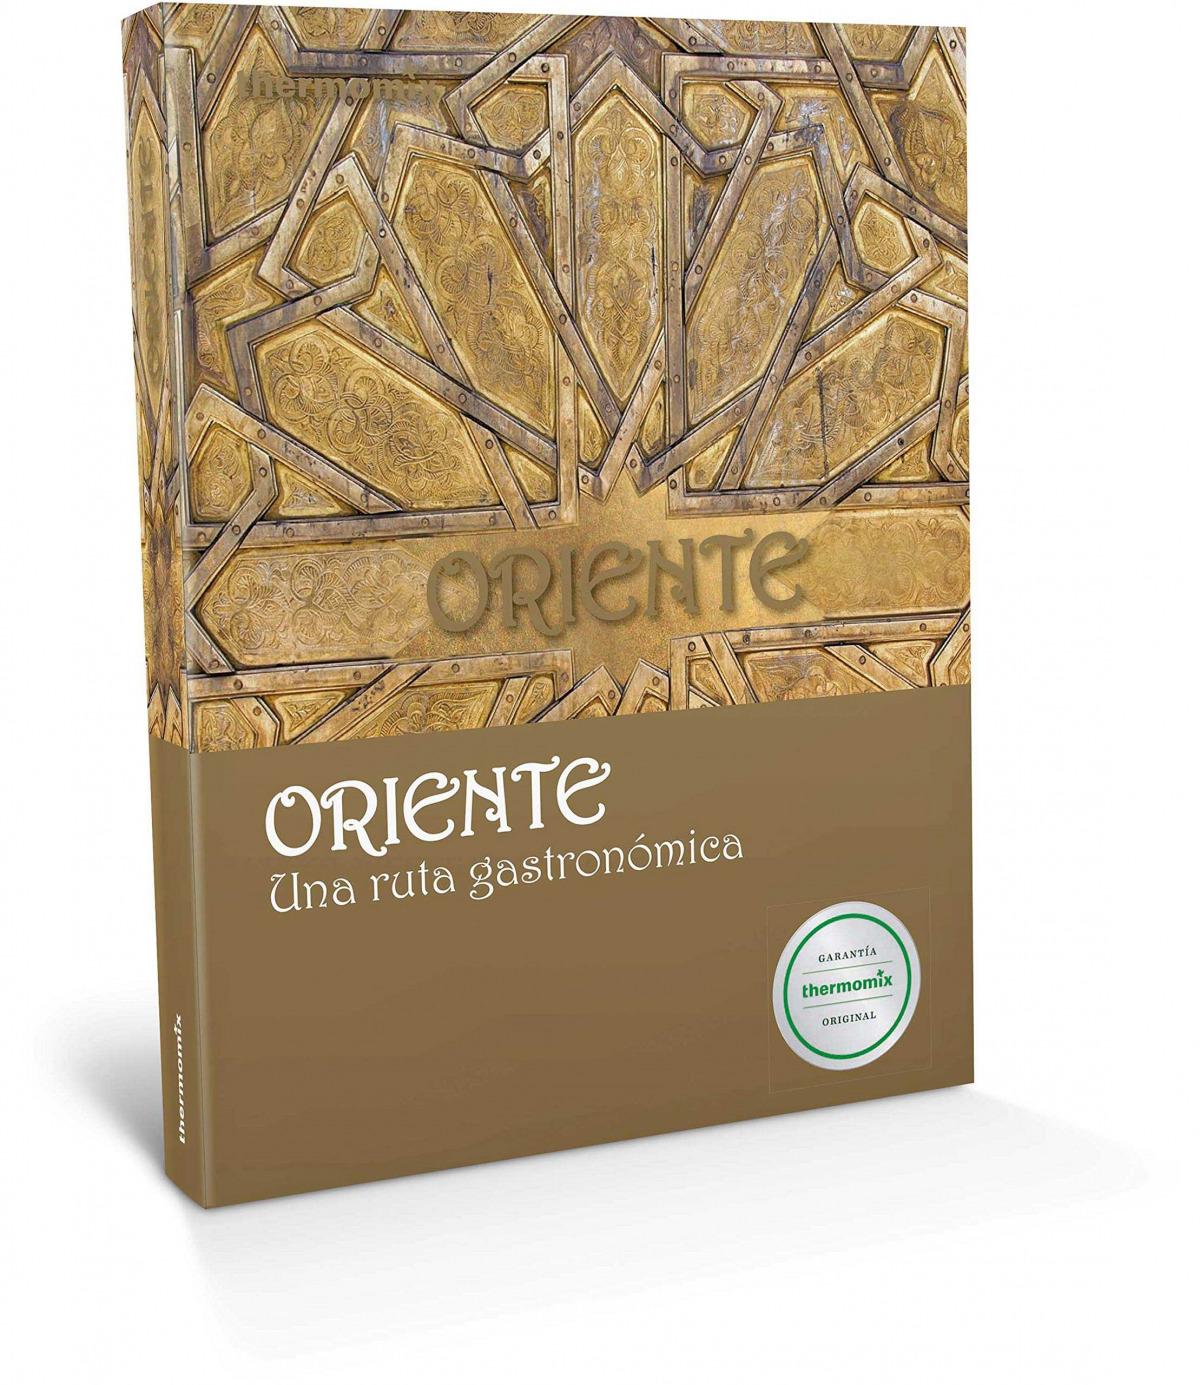 ORIENTE 9788416902149